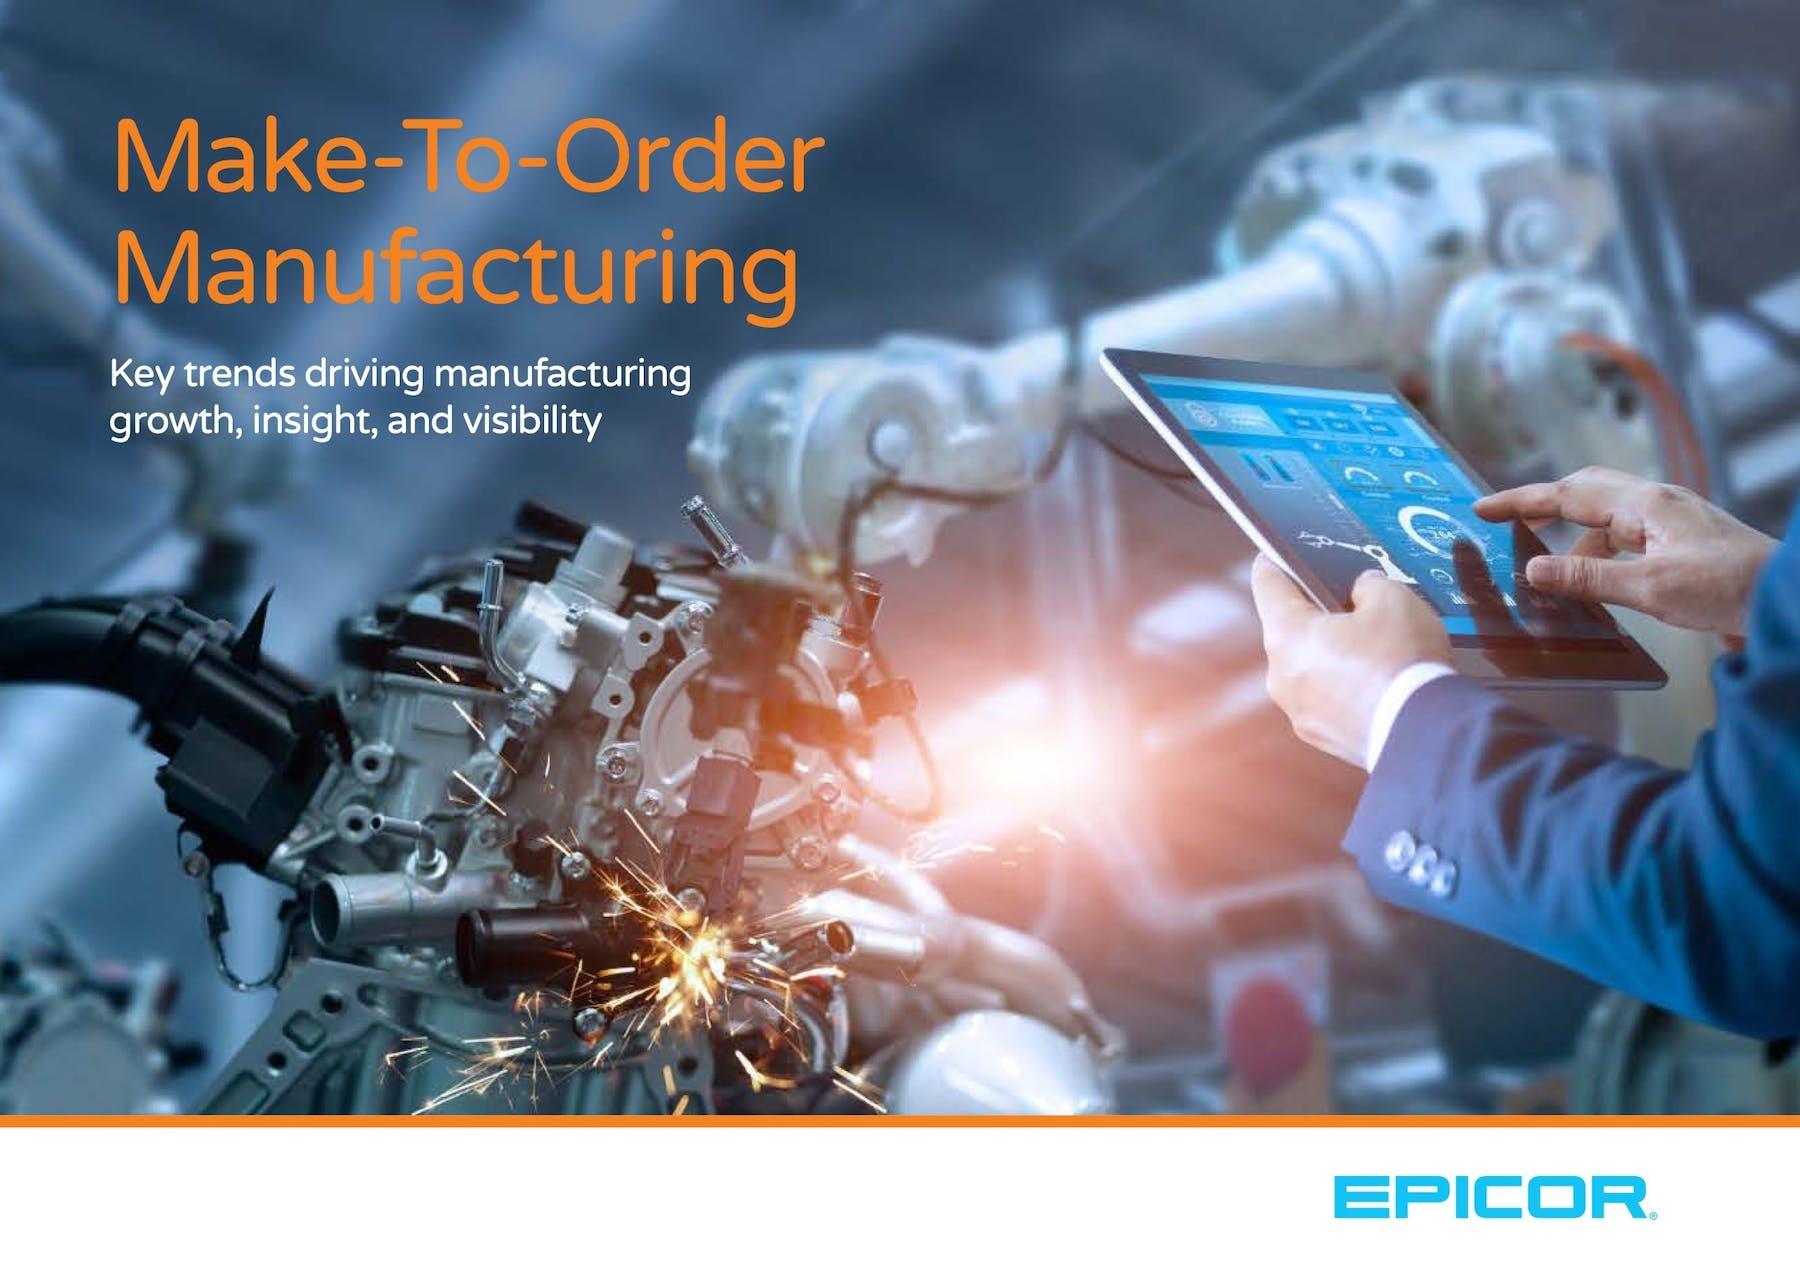 Epicor ERP White Paper - Make-To-Order Manufacturing